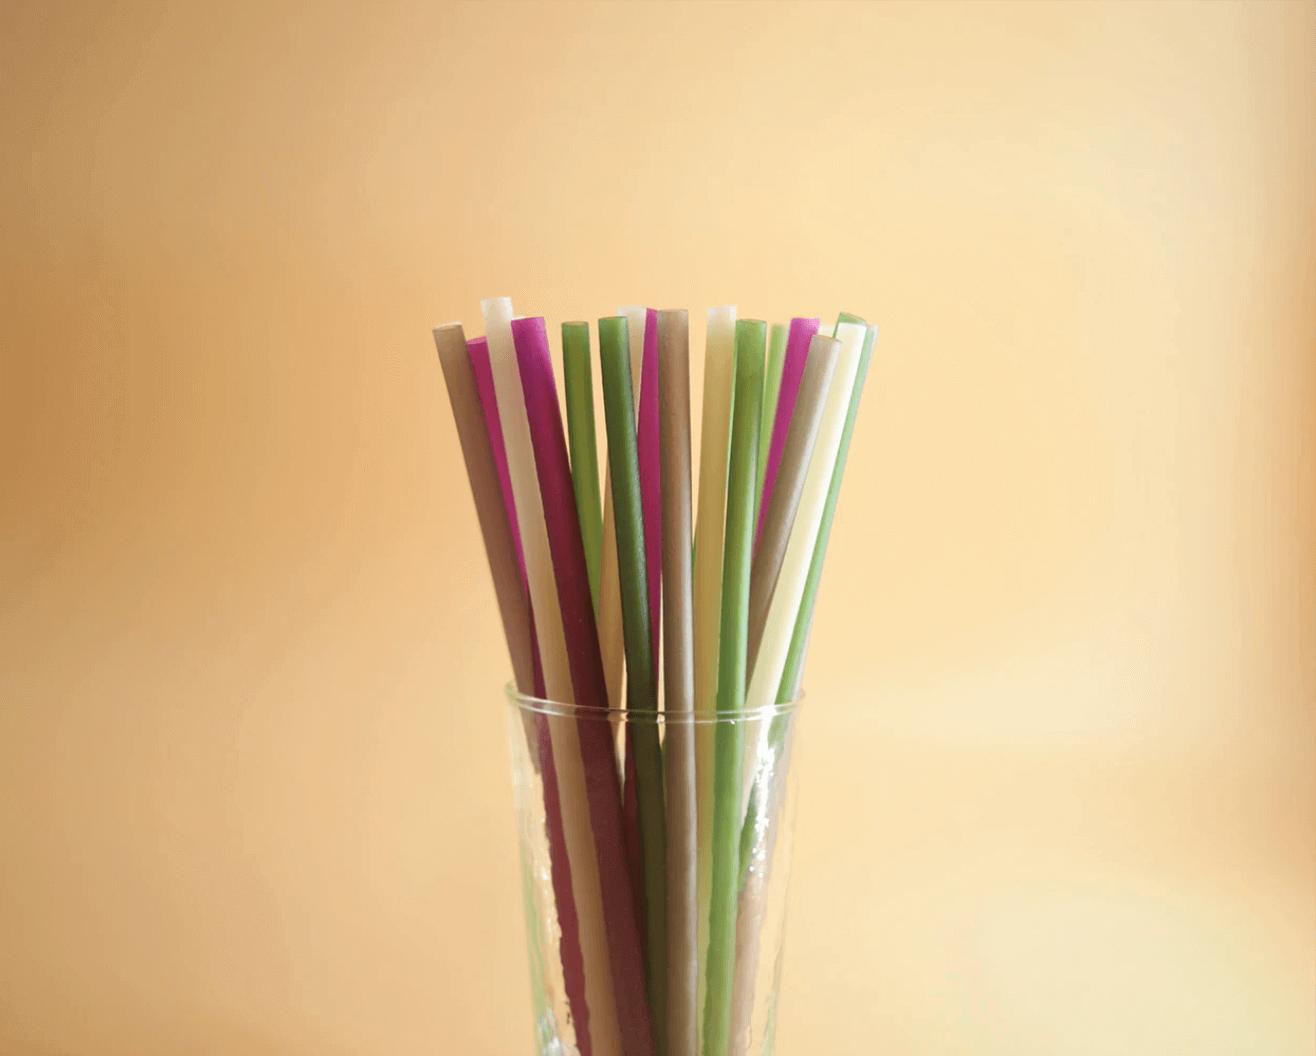 Plastic straws in a jar.